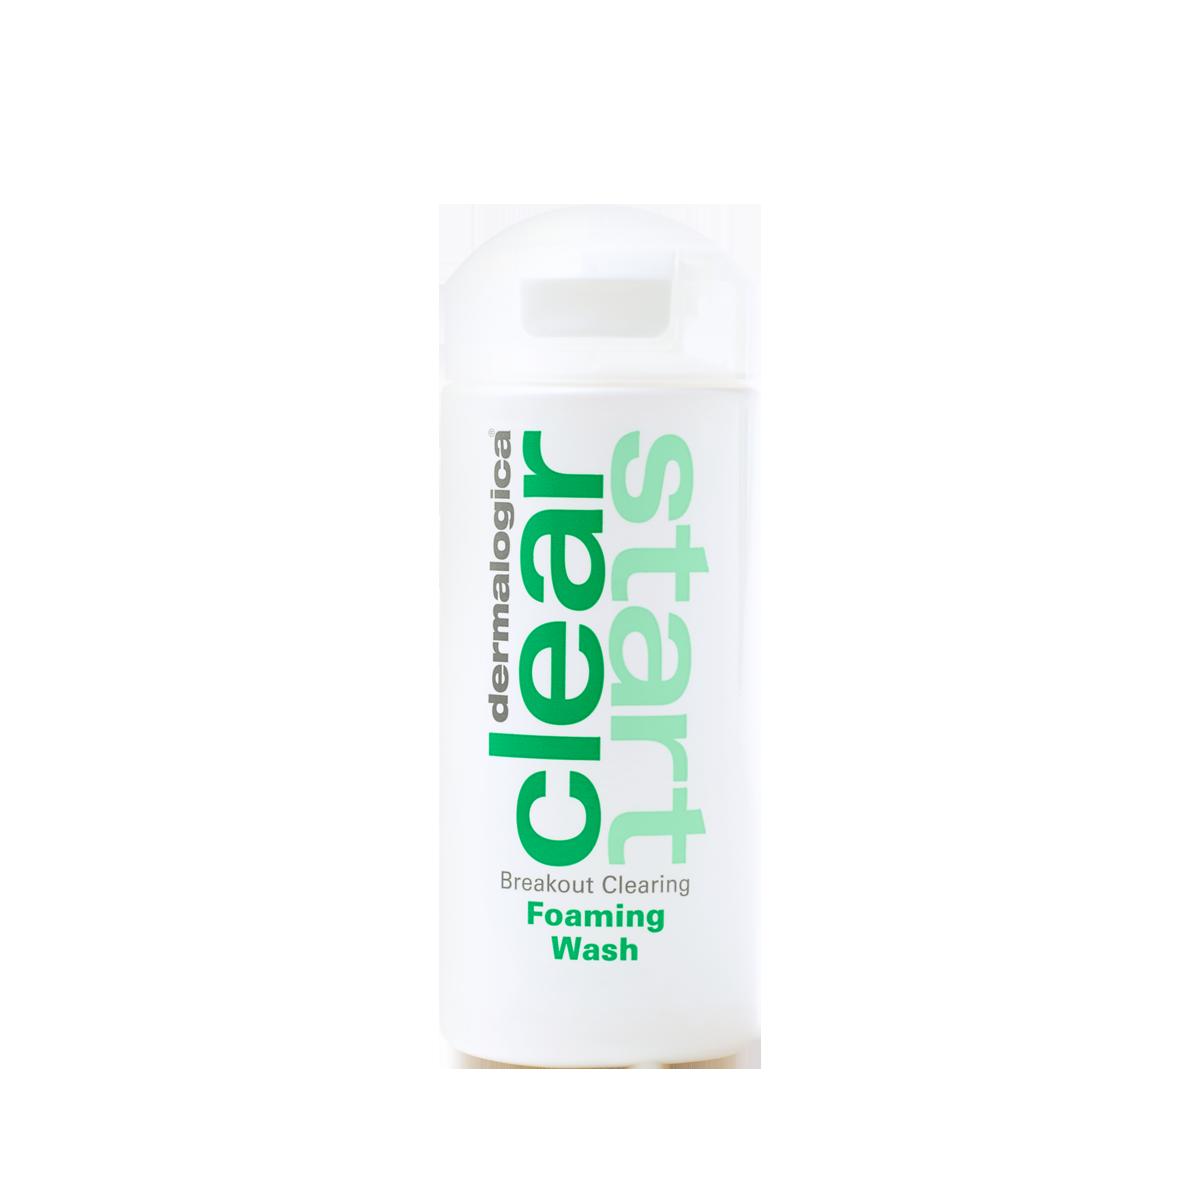 Clear Start Breakout Clearing Foaming Wash 177ml-1